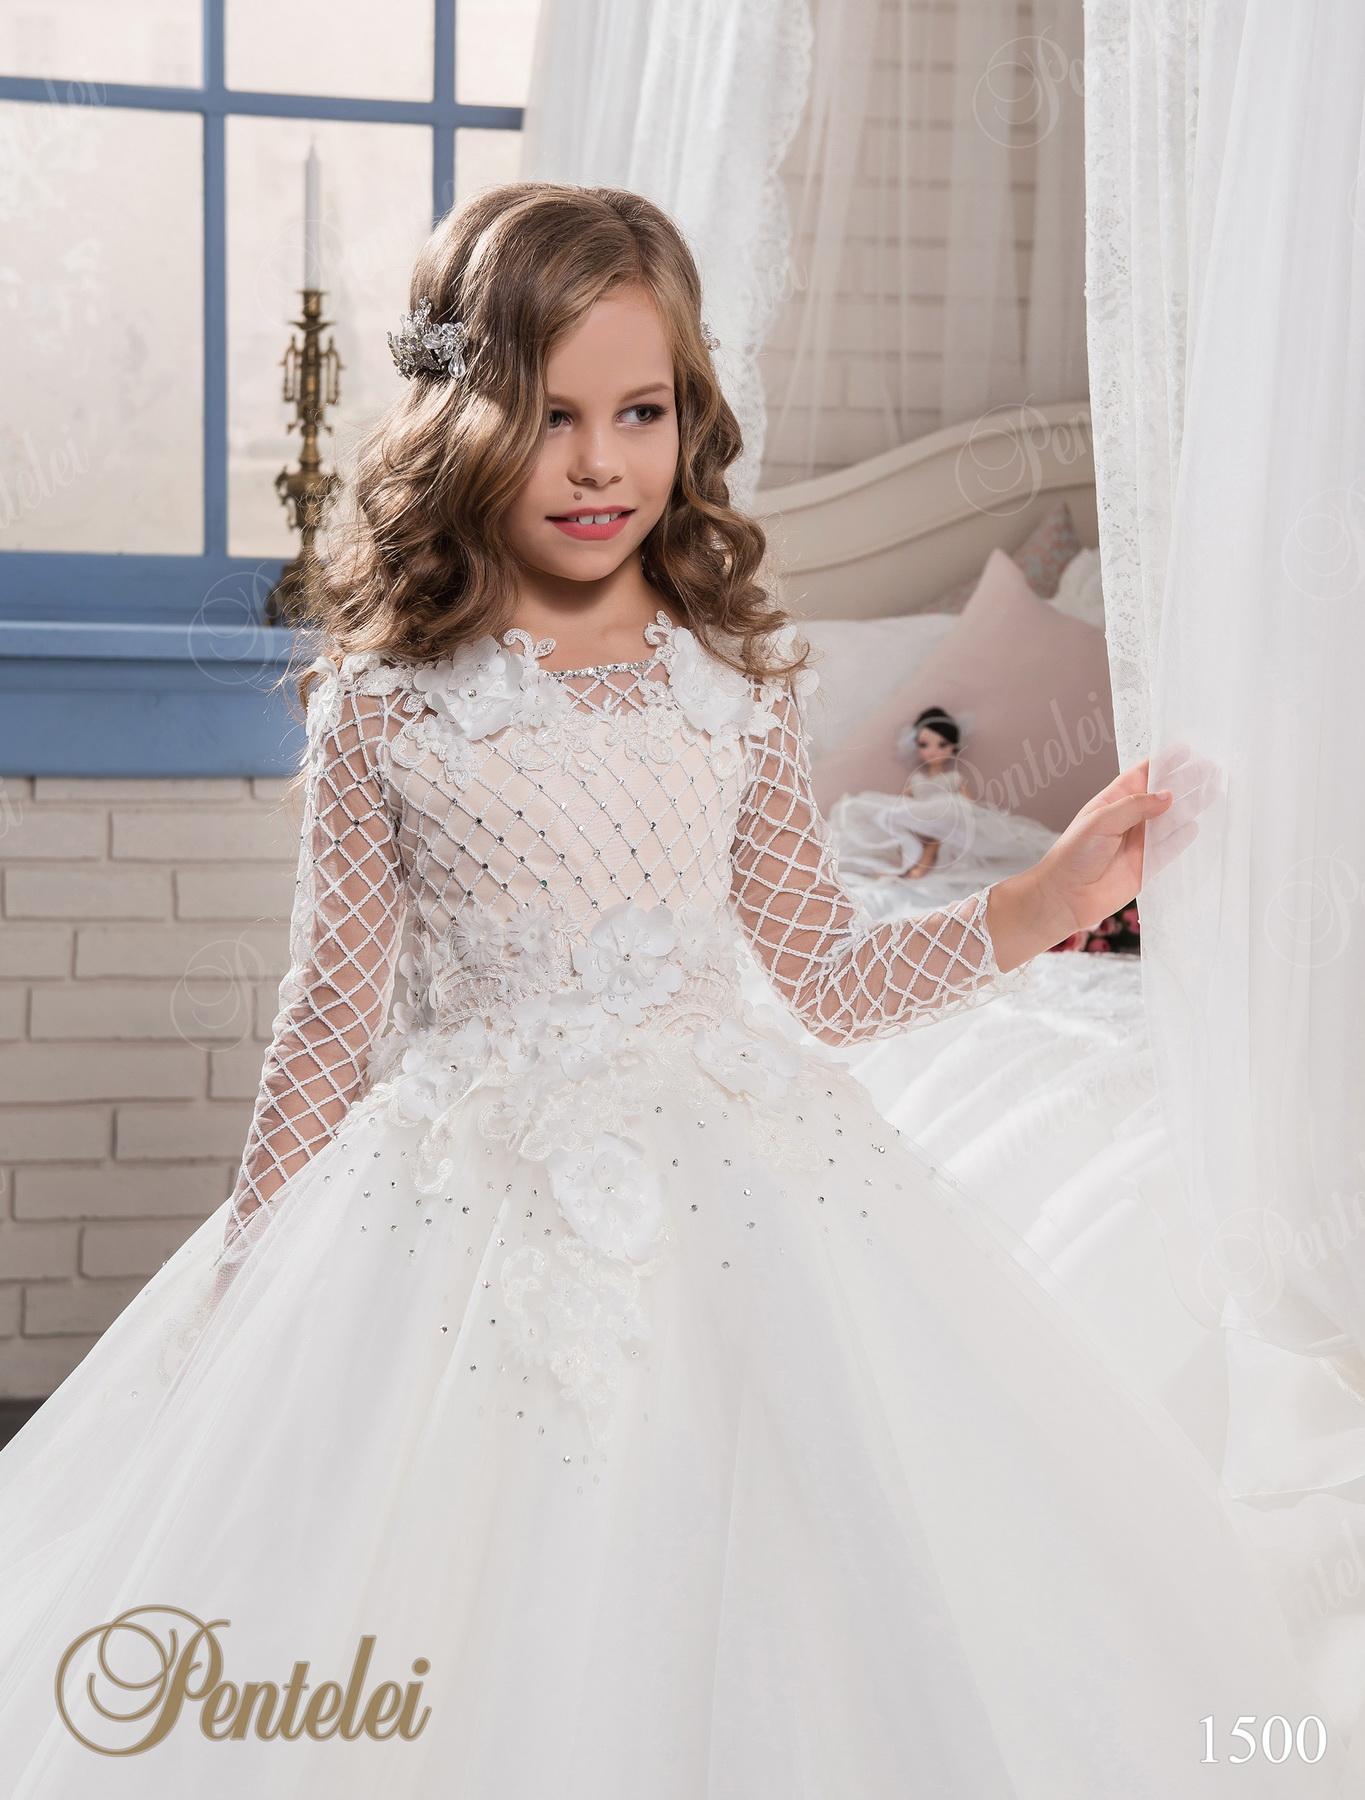 Rochie De Printesa Silueta De Nunta Pentru Copii